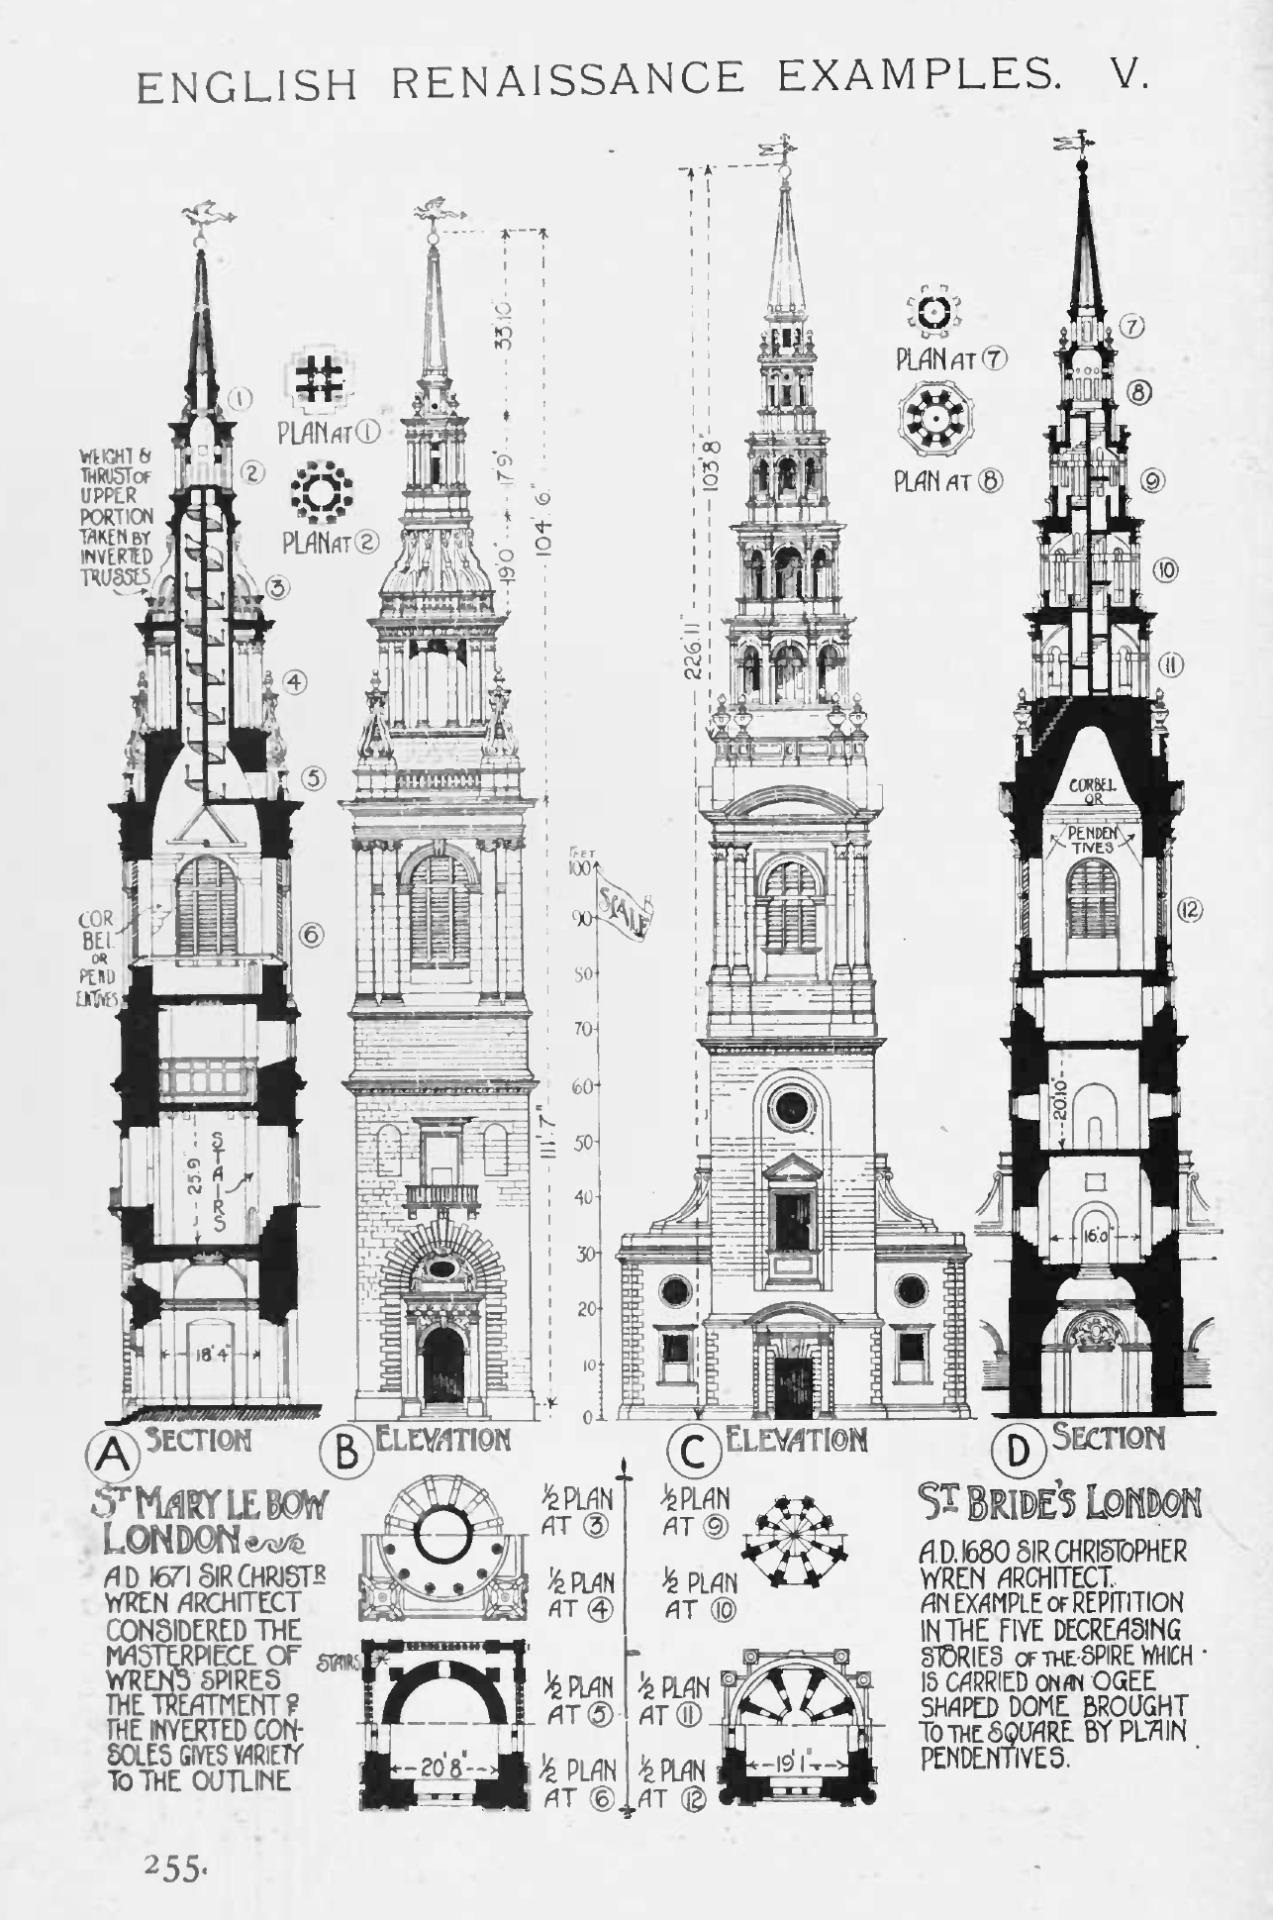 Best Kitchen Gallery: European Architecture English Renaissance Church Steeple A History of English Renaissance Architecture on rachelxblog.com